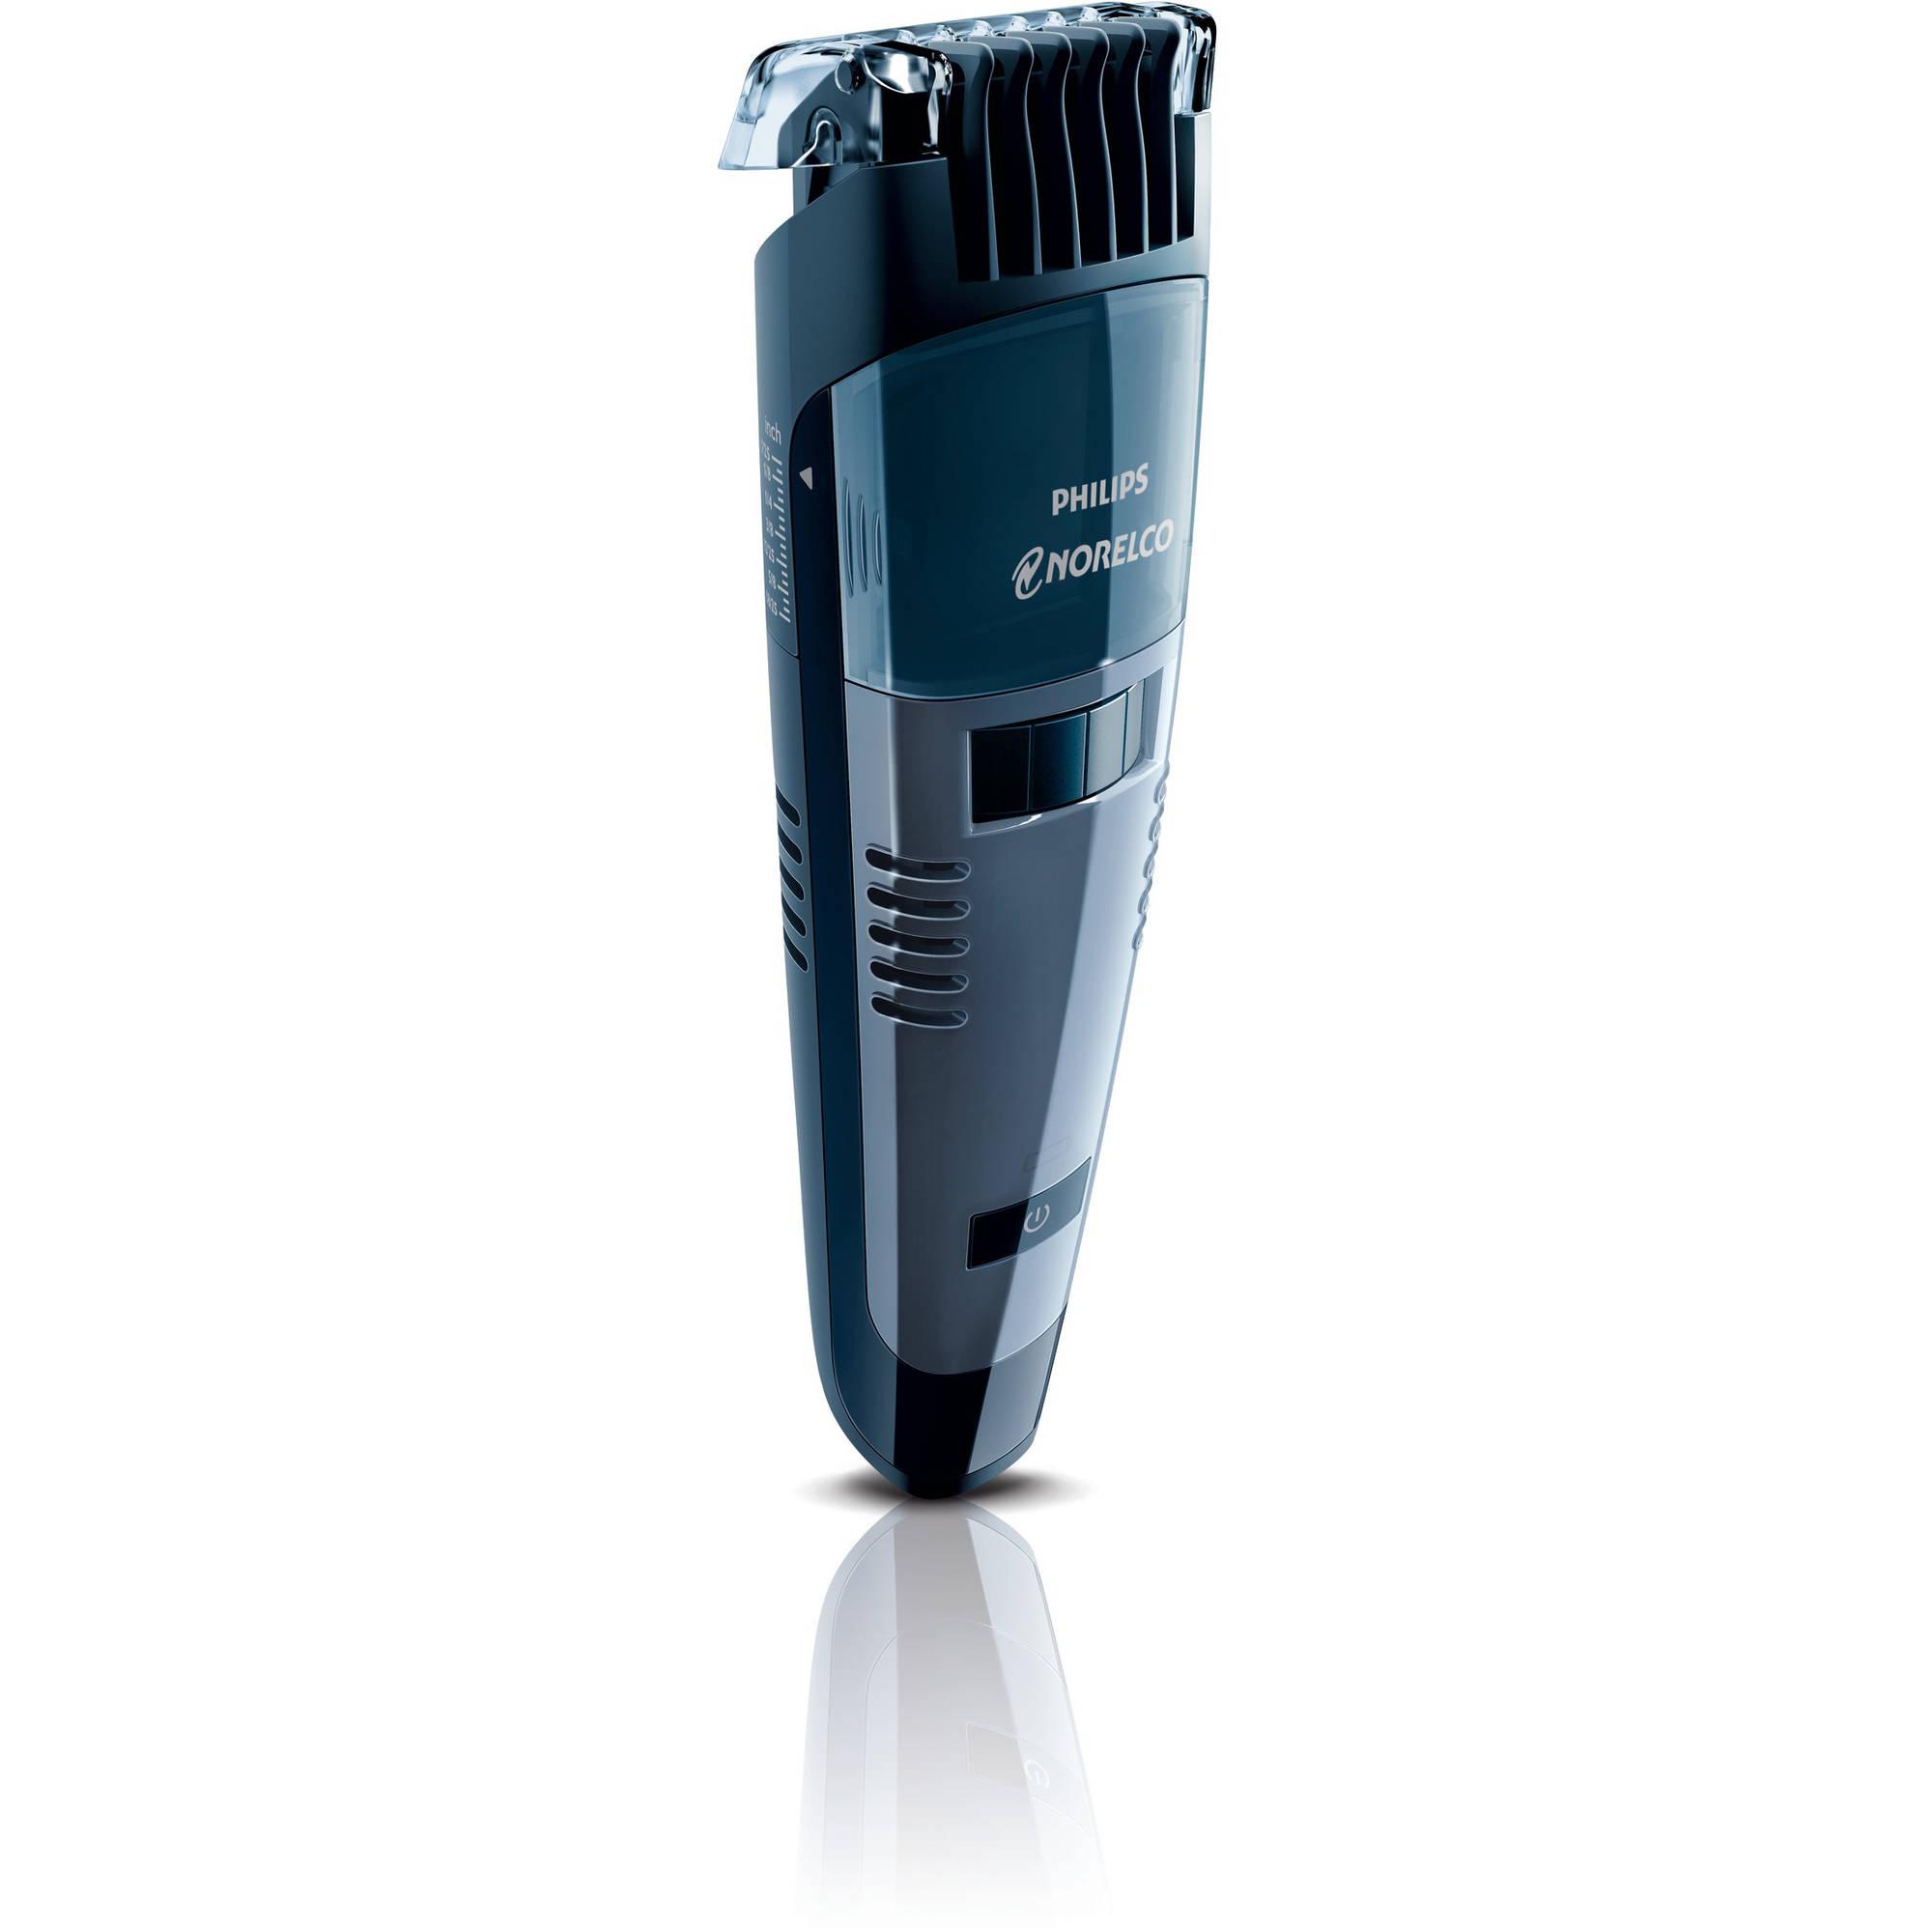 Philips Norelco BeardTrimmer 7100 (Model # QT4050)